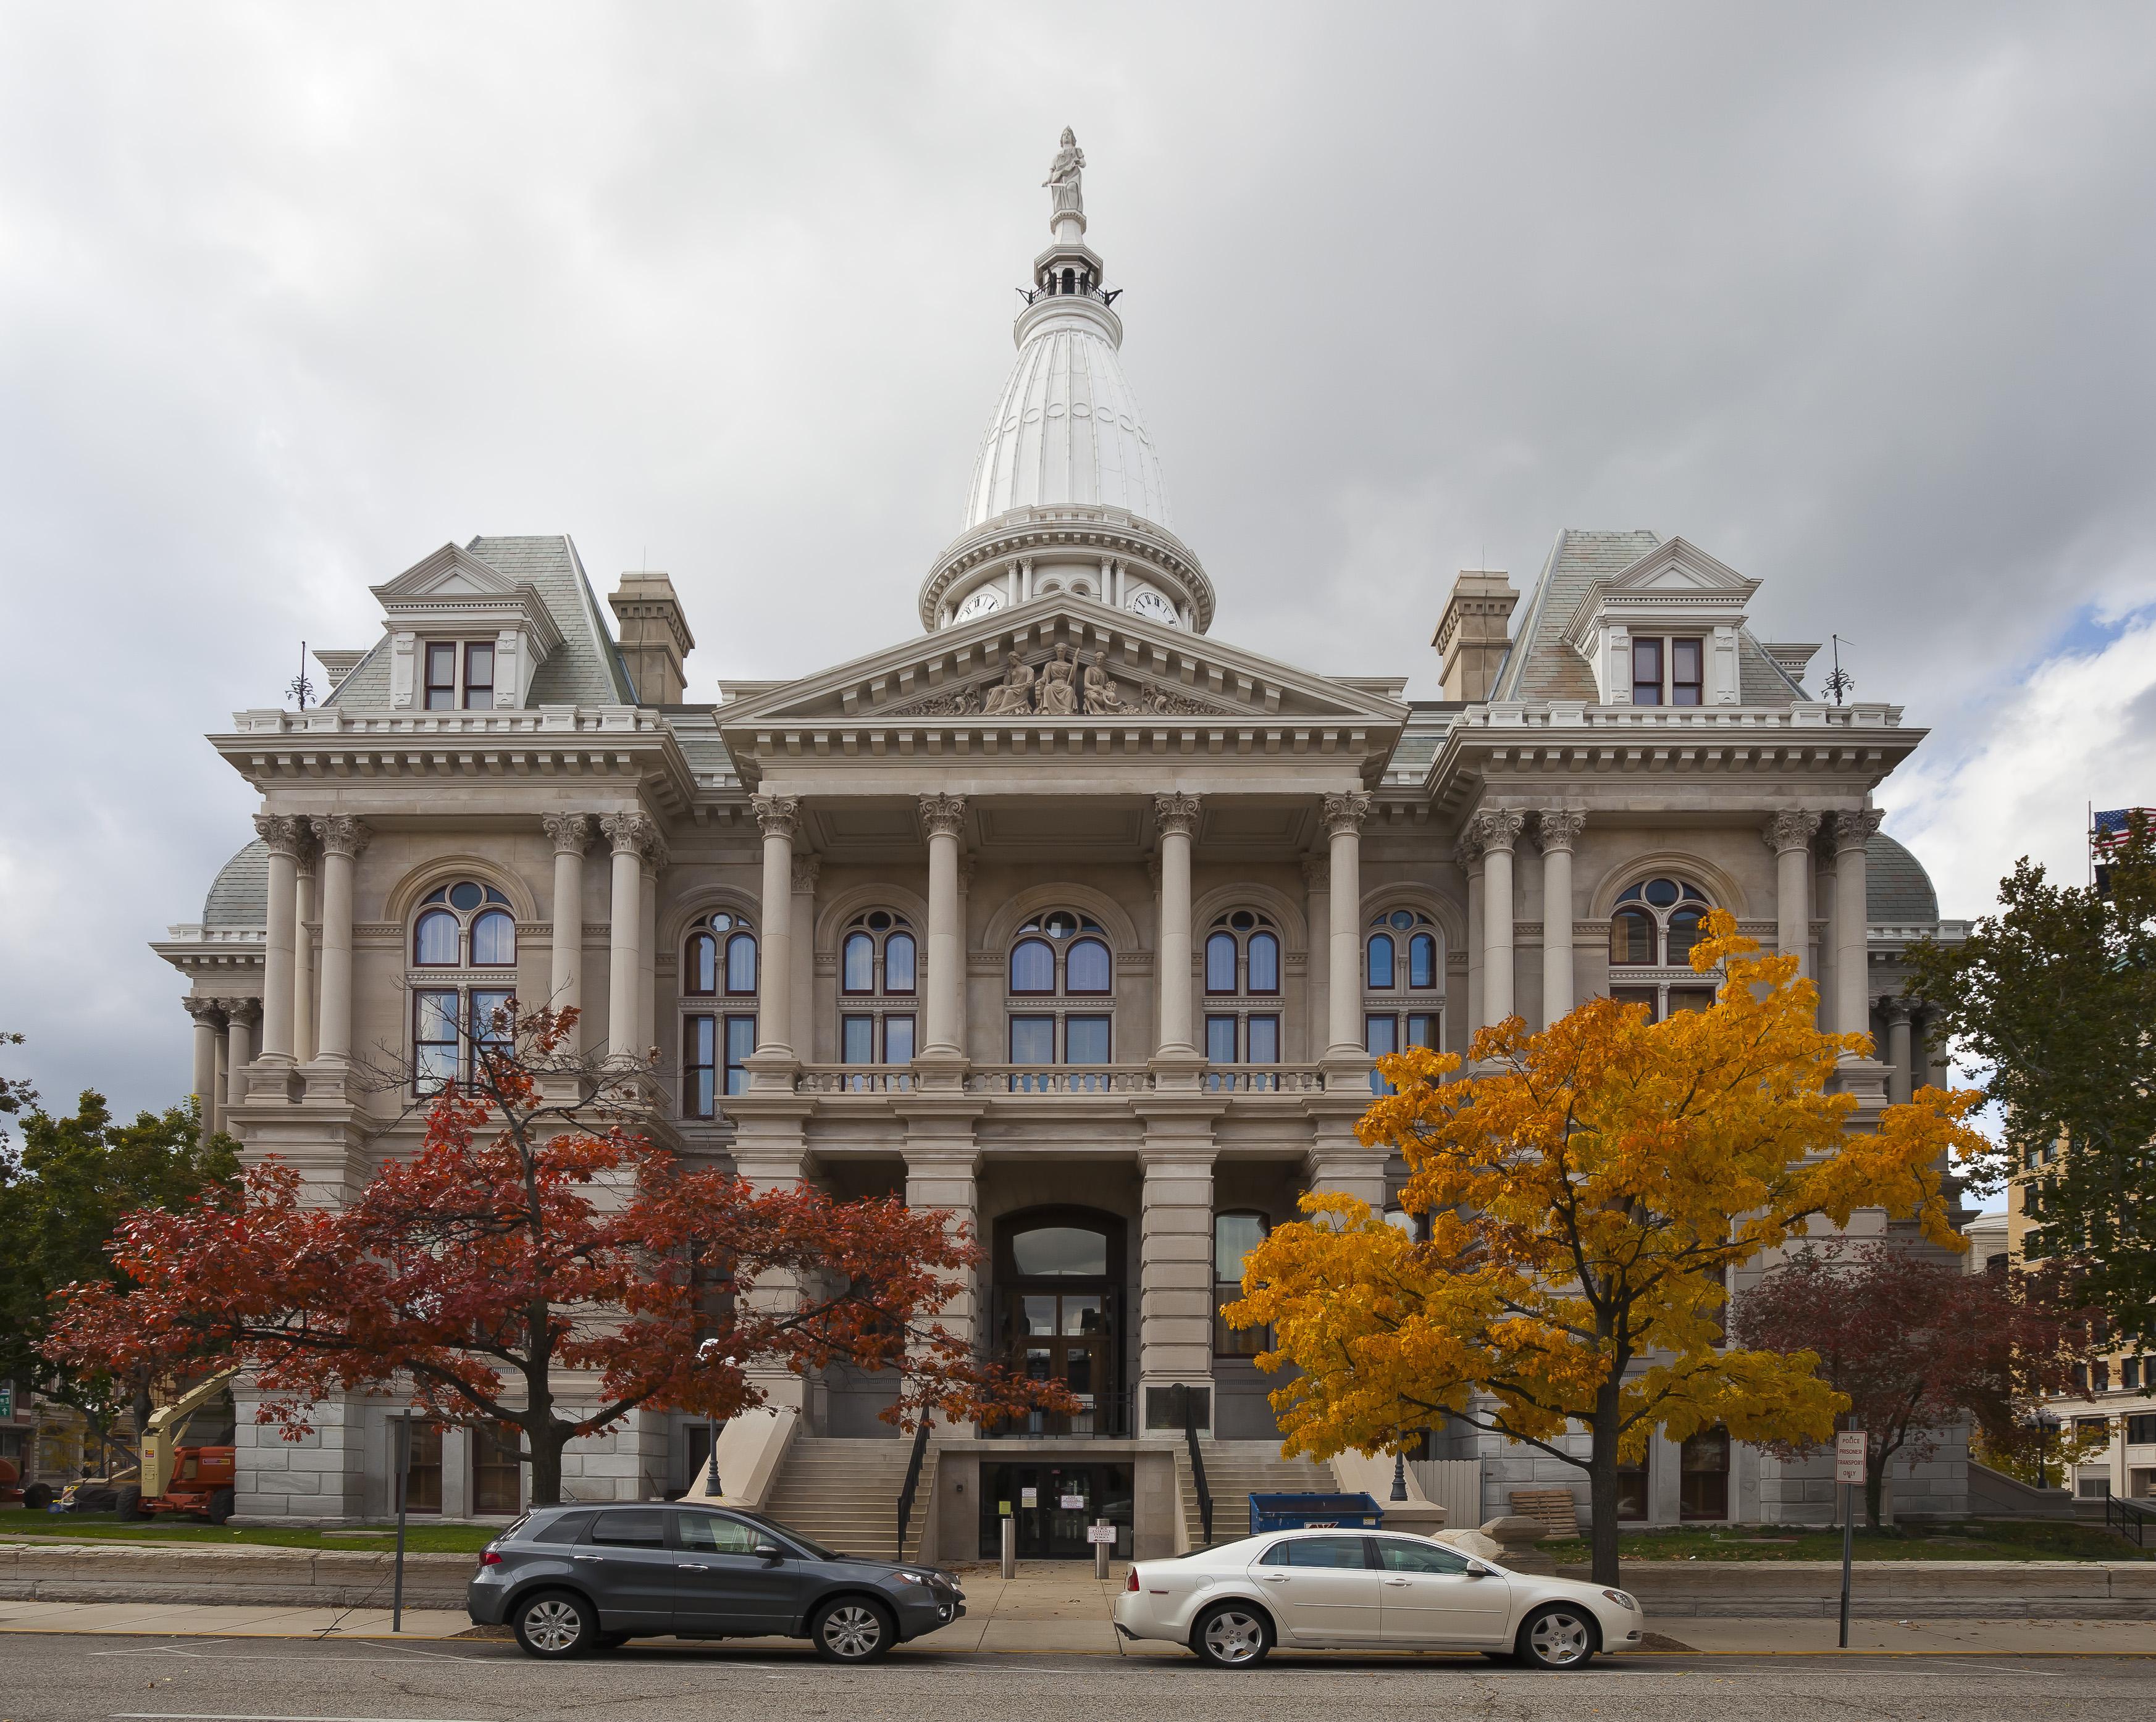 Corte adolescente del condado de Court lafayette